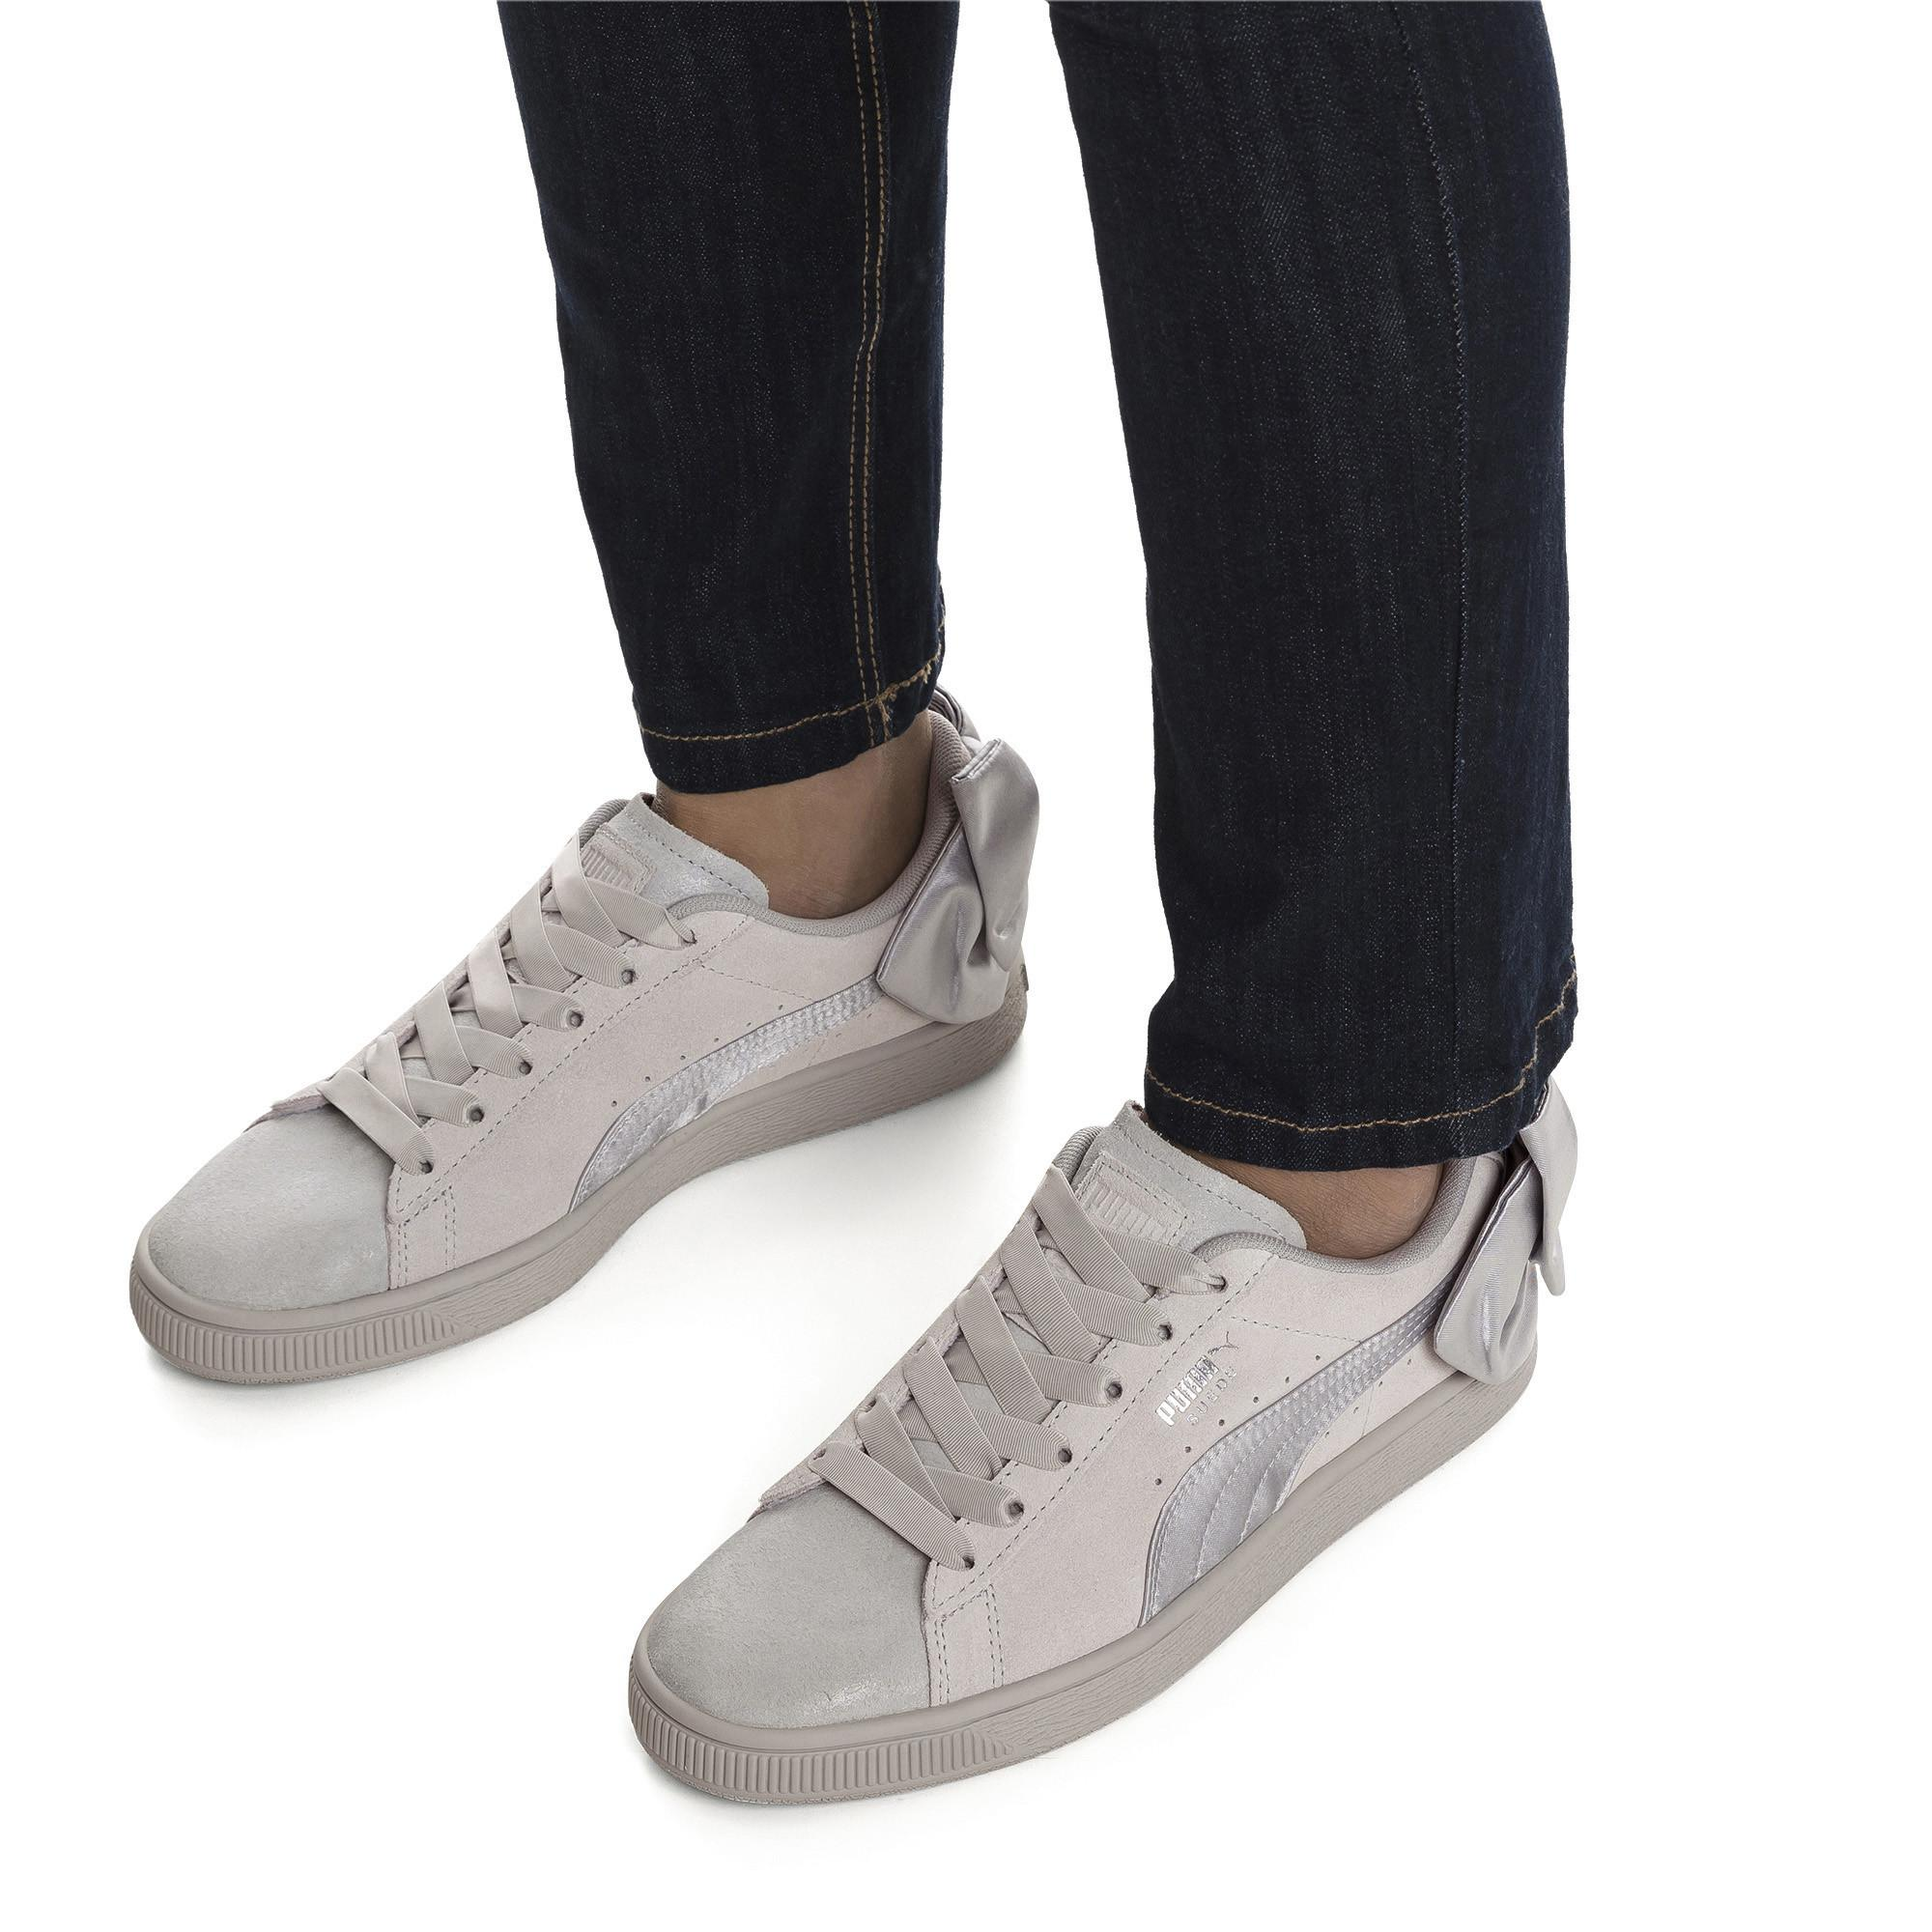 PUMA Suede Bow Galaxy Women's Sneakers